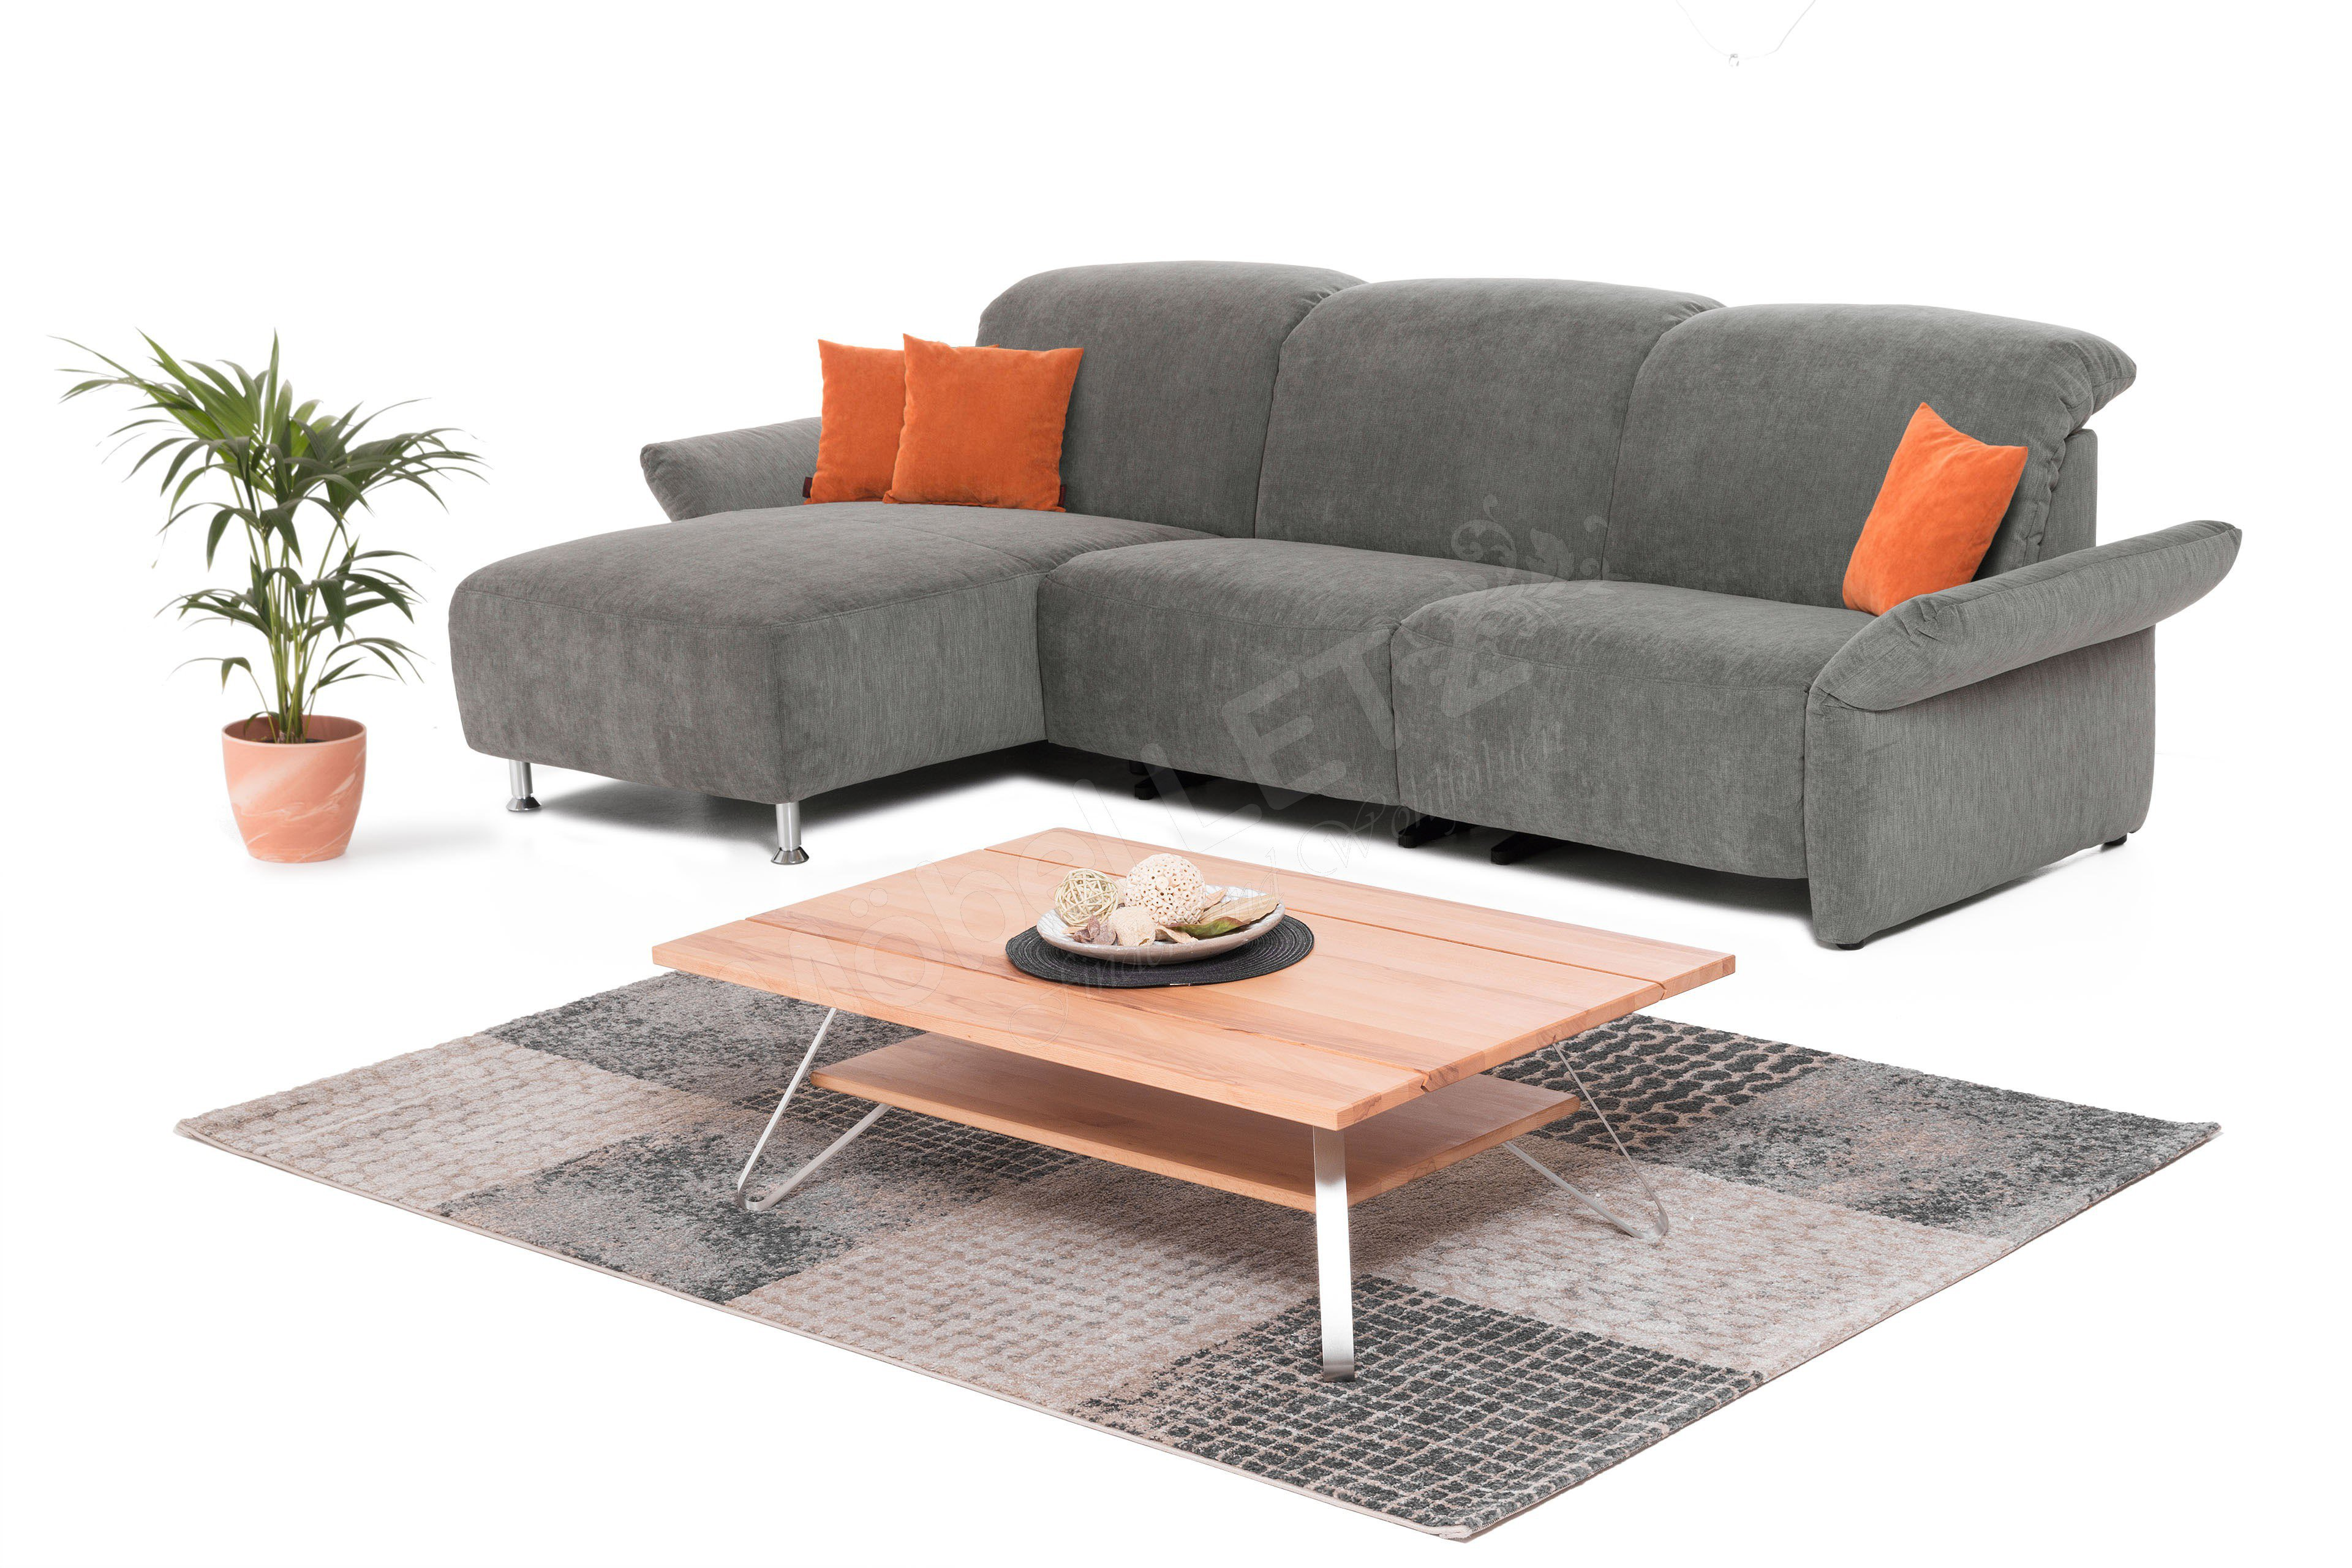 k w polsterm bel cindy eckgarnitur grau m bel letz ihr. Black Bedroom Furniture Sets. Home Design Ideas